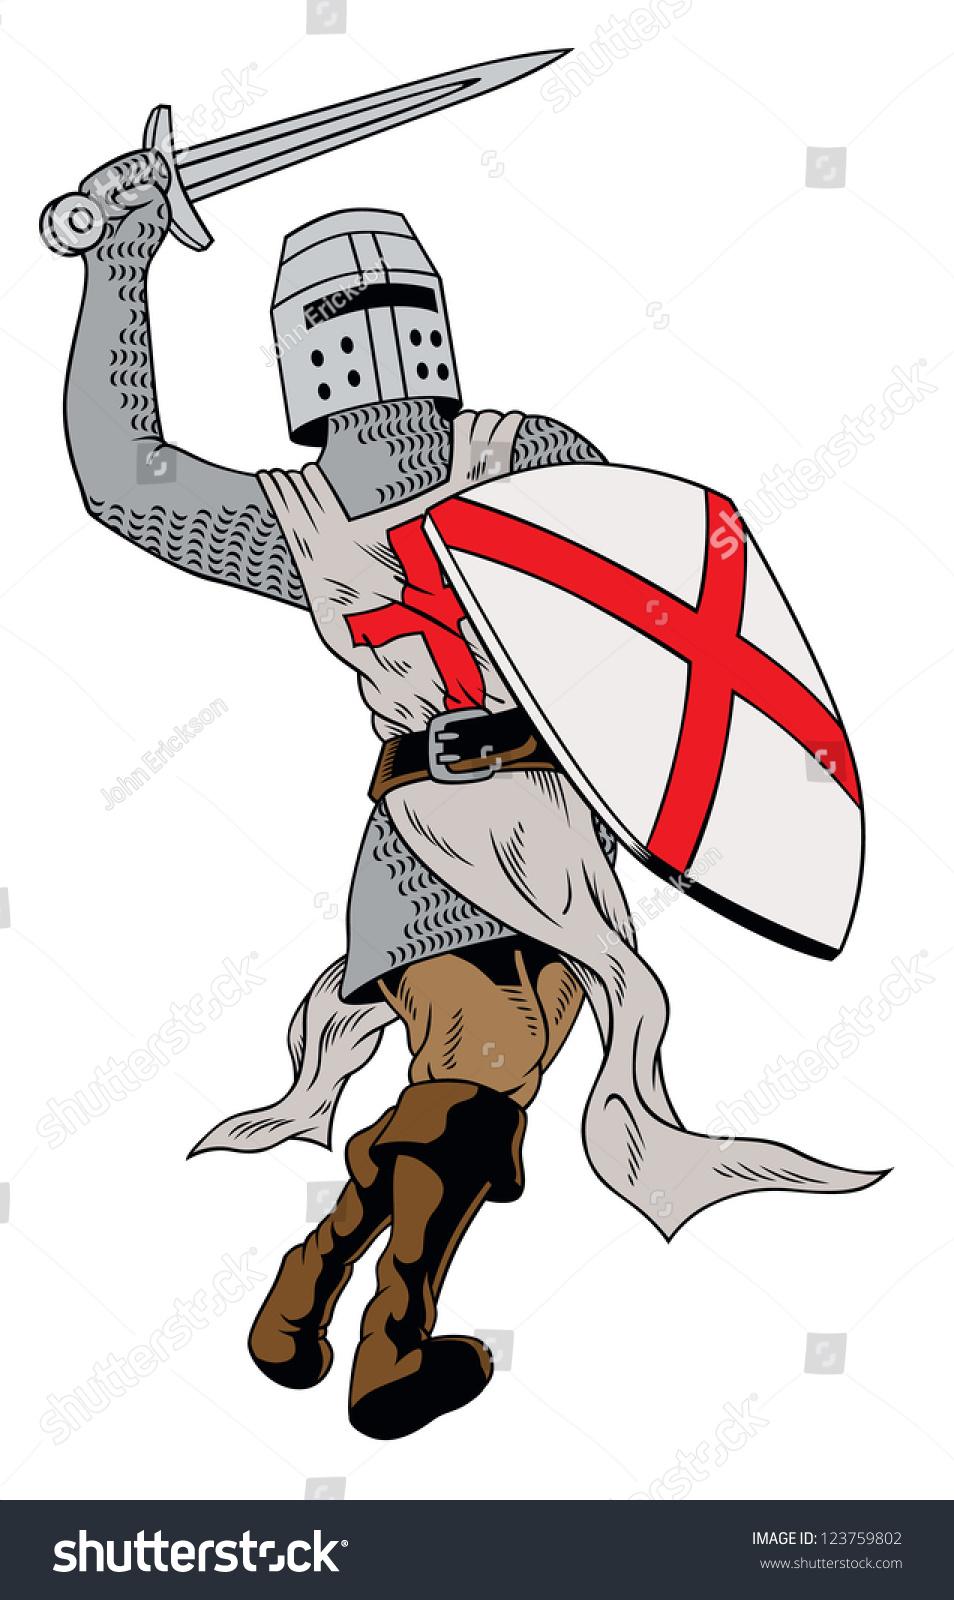 954x1600 Warrior Clipart Crusader 4041791